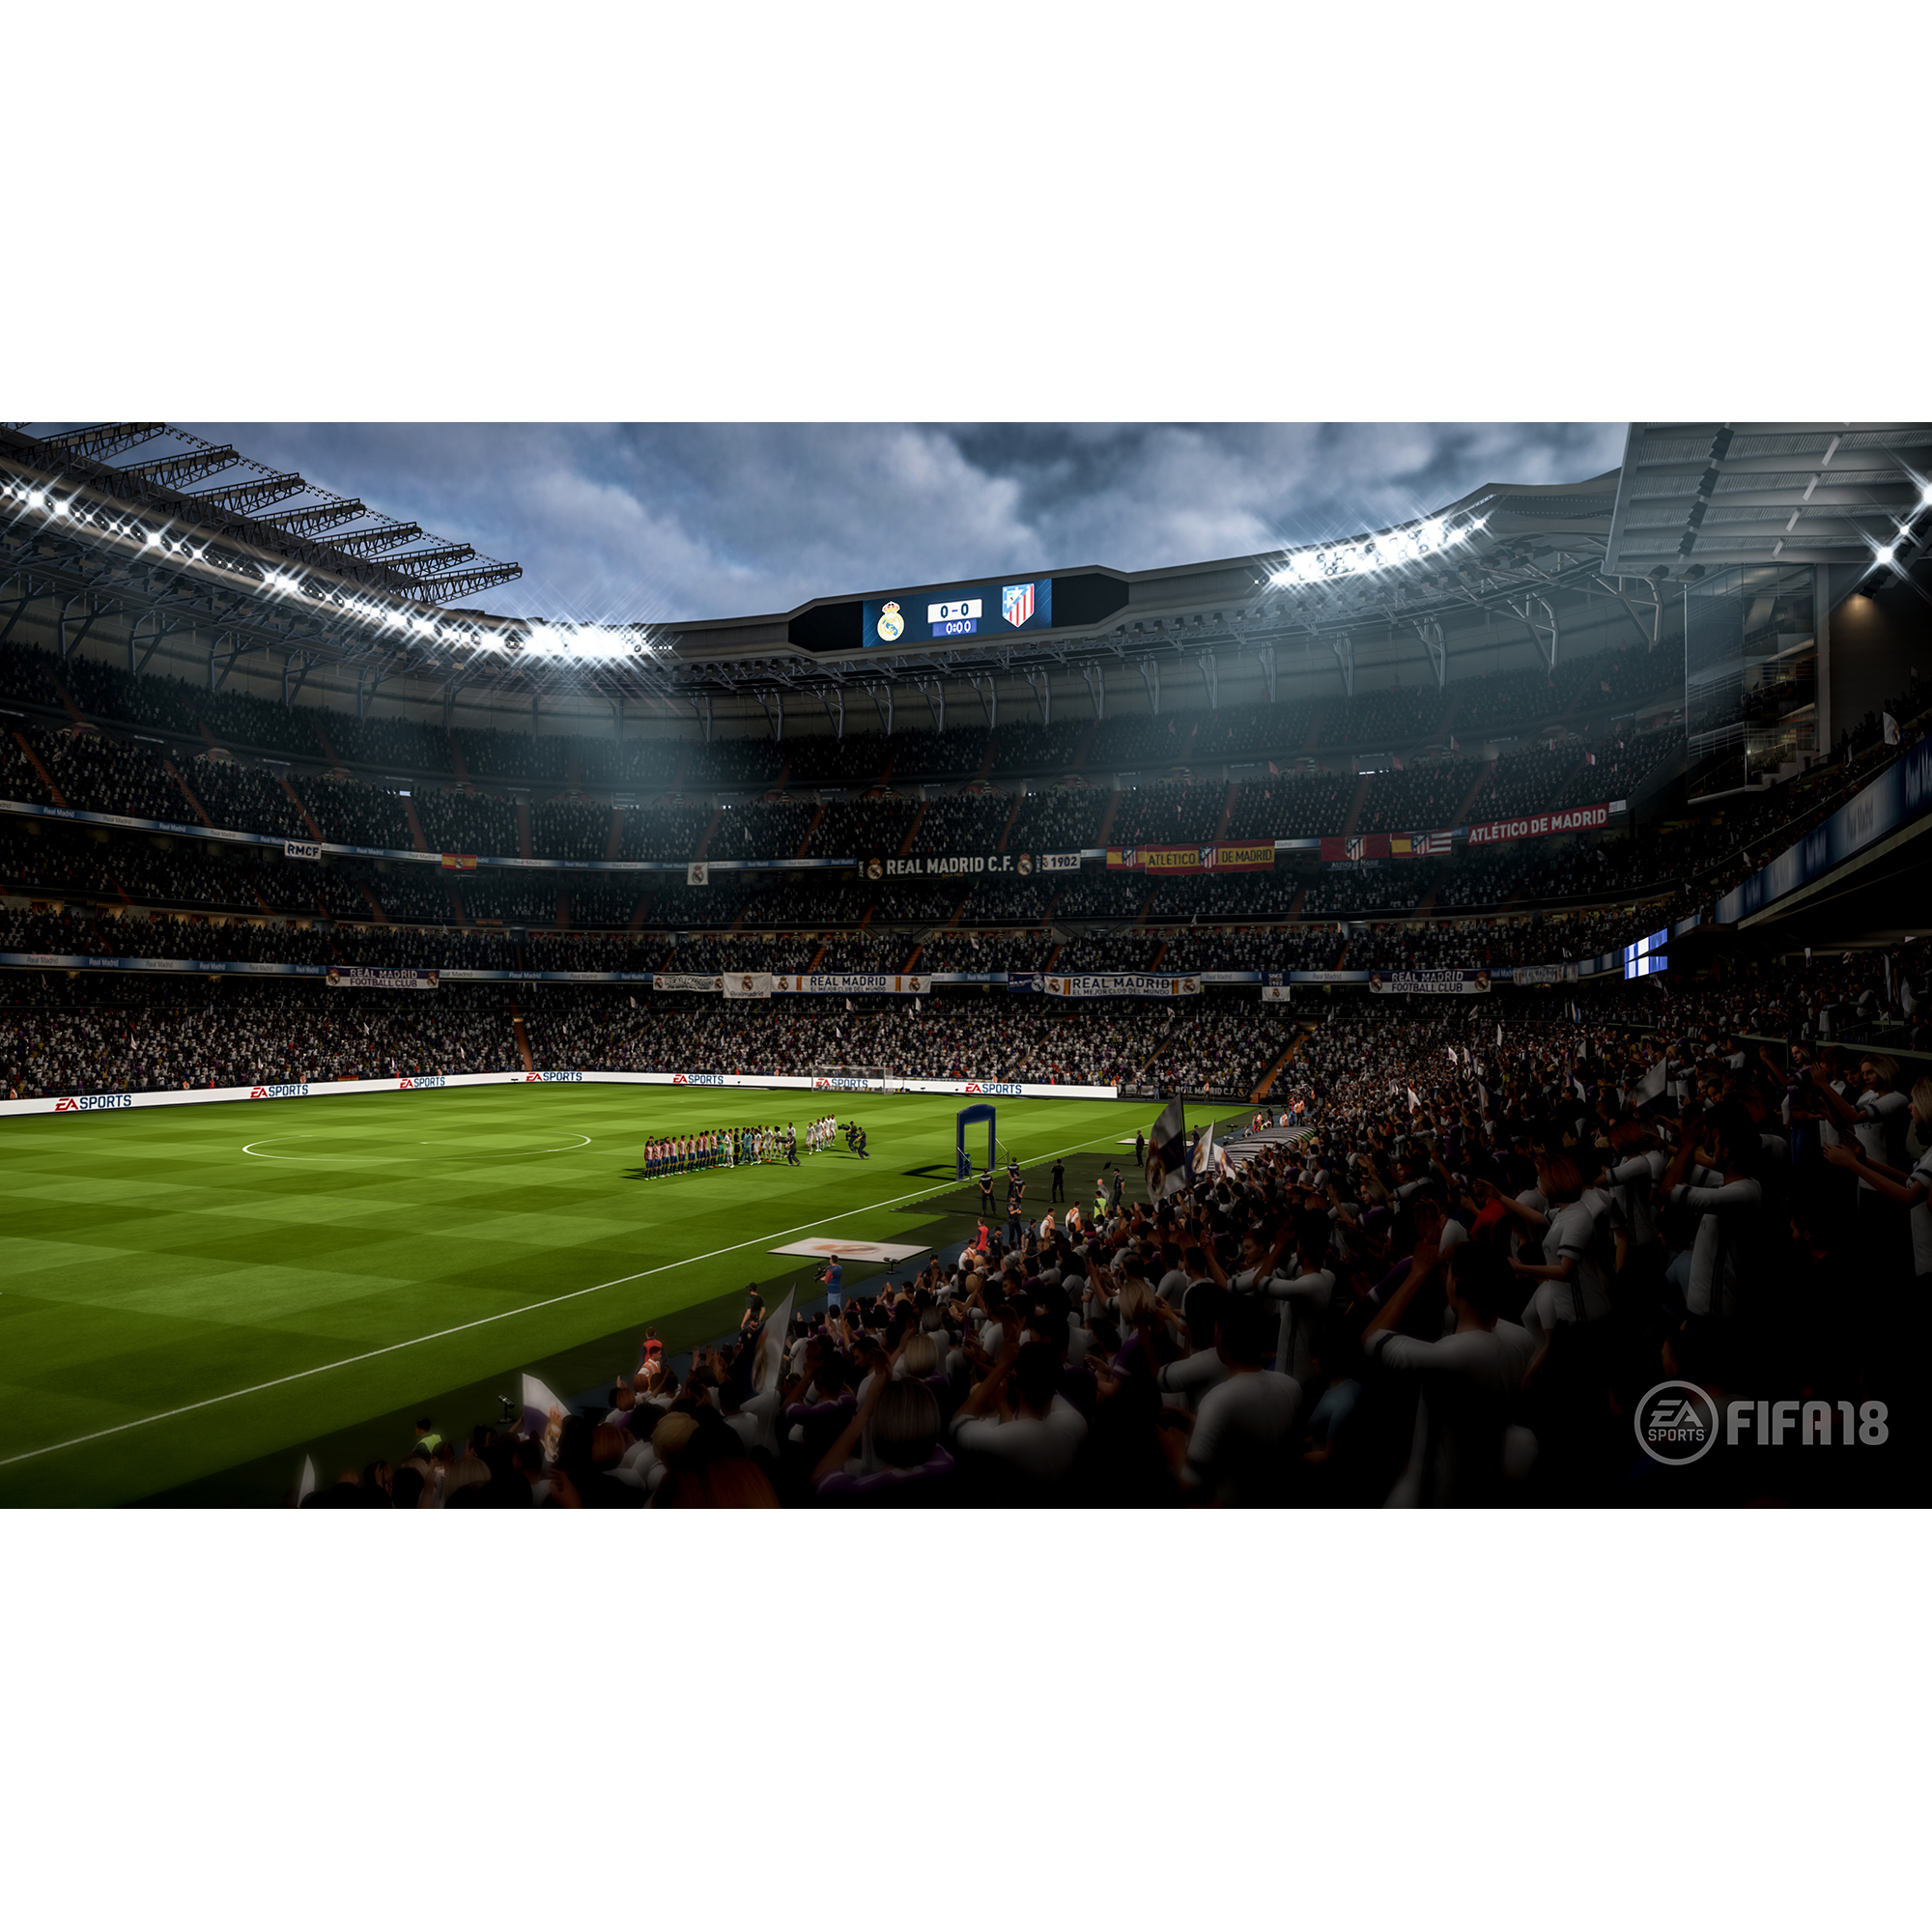 Joc FIFA 18 pentru PlayStation 4 8